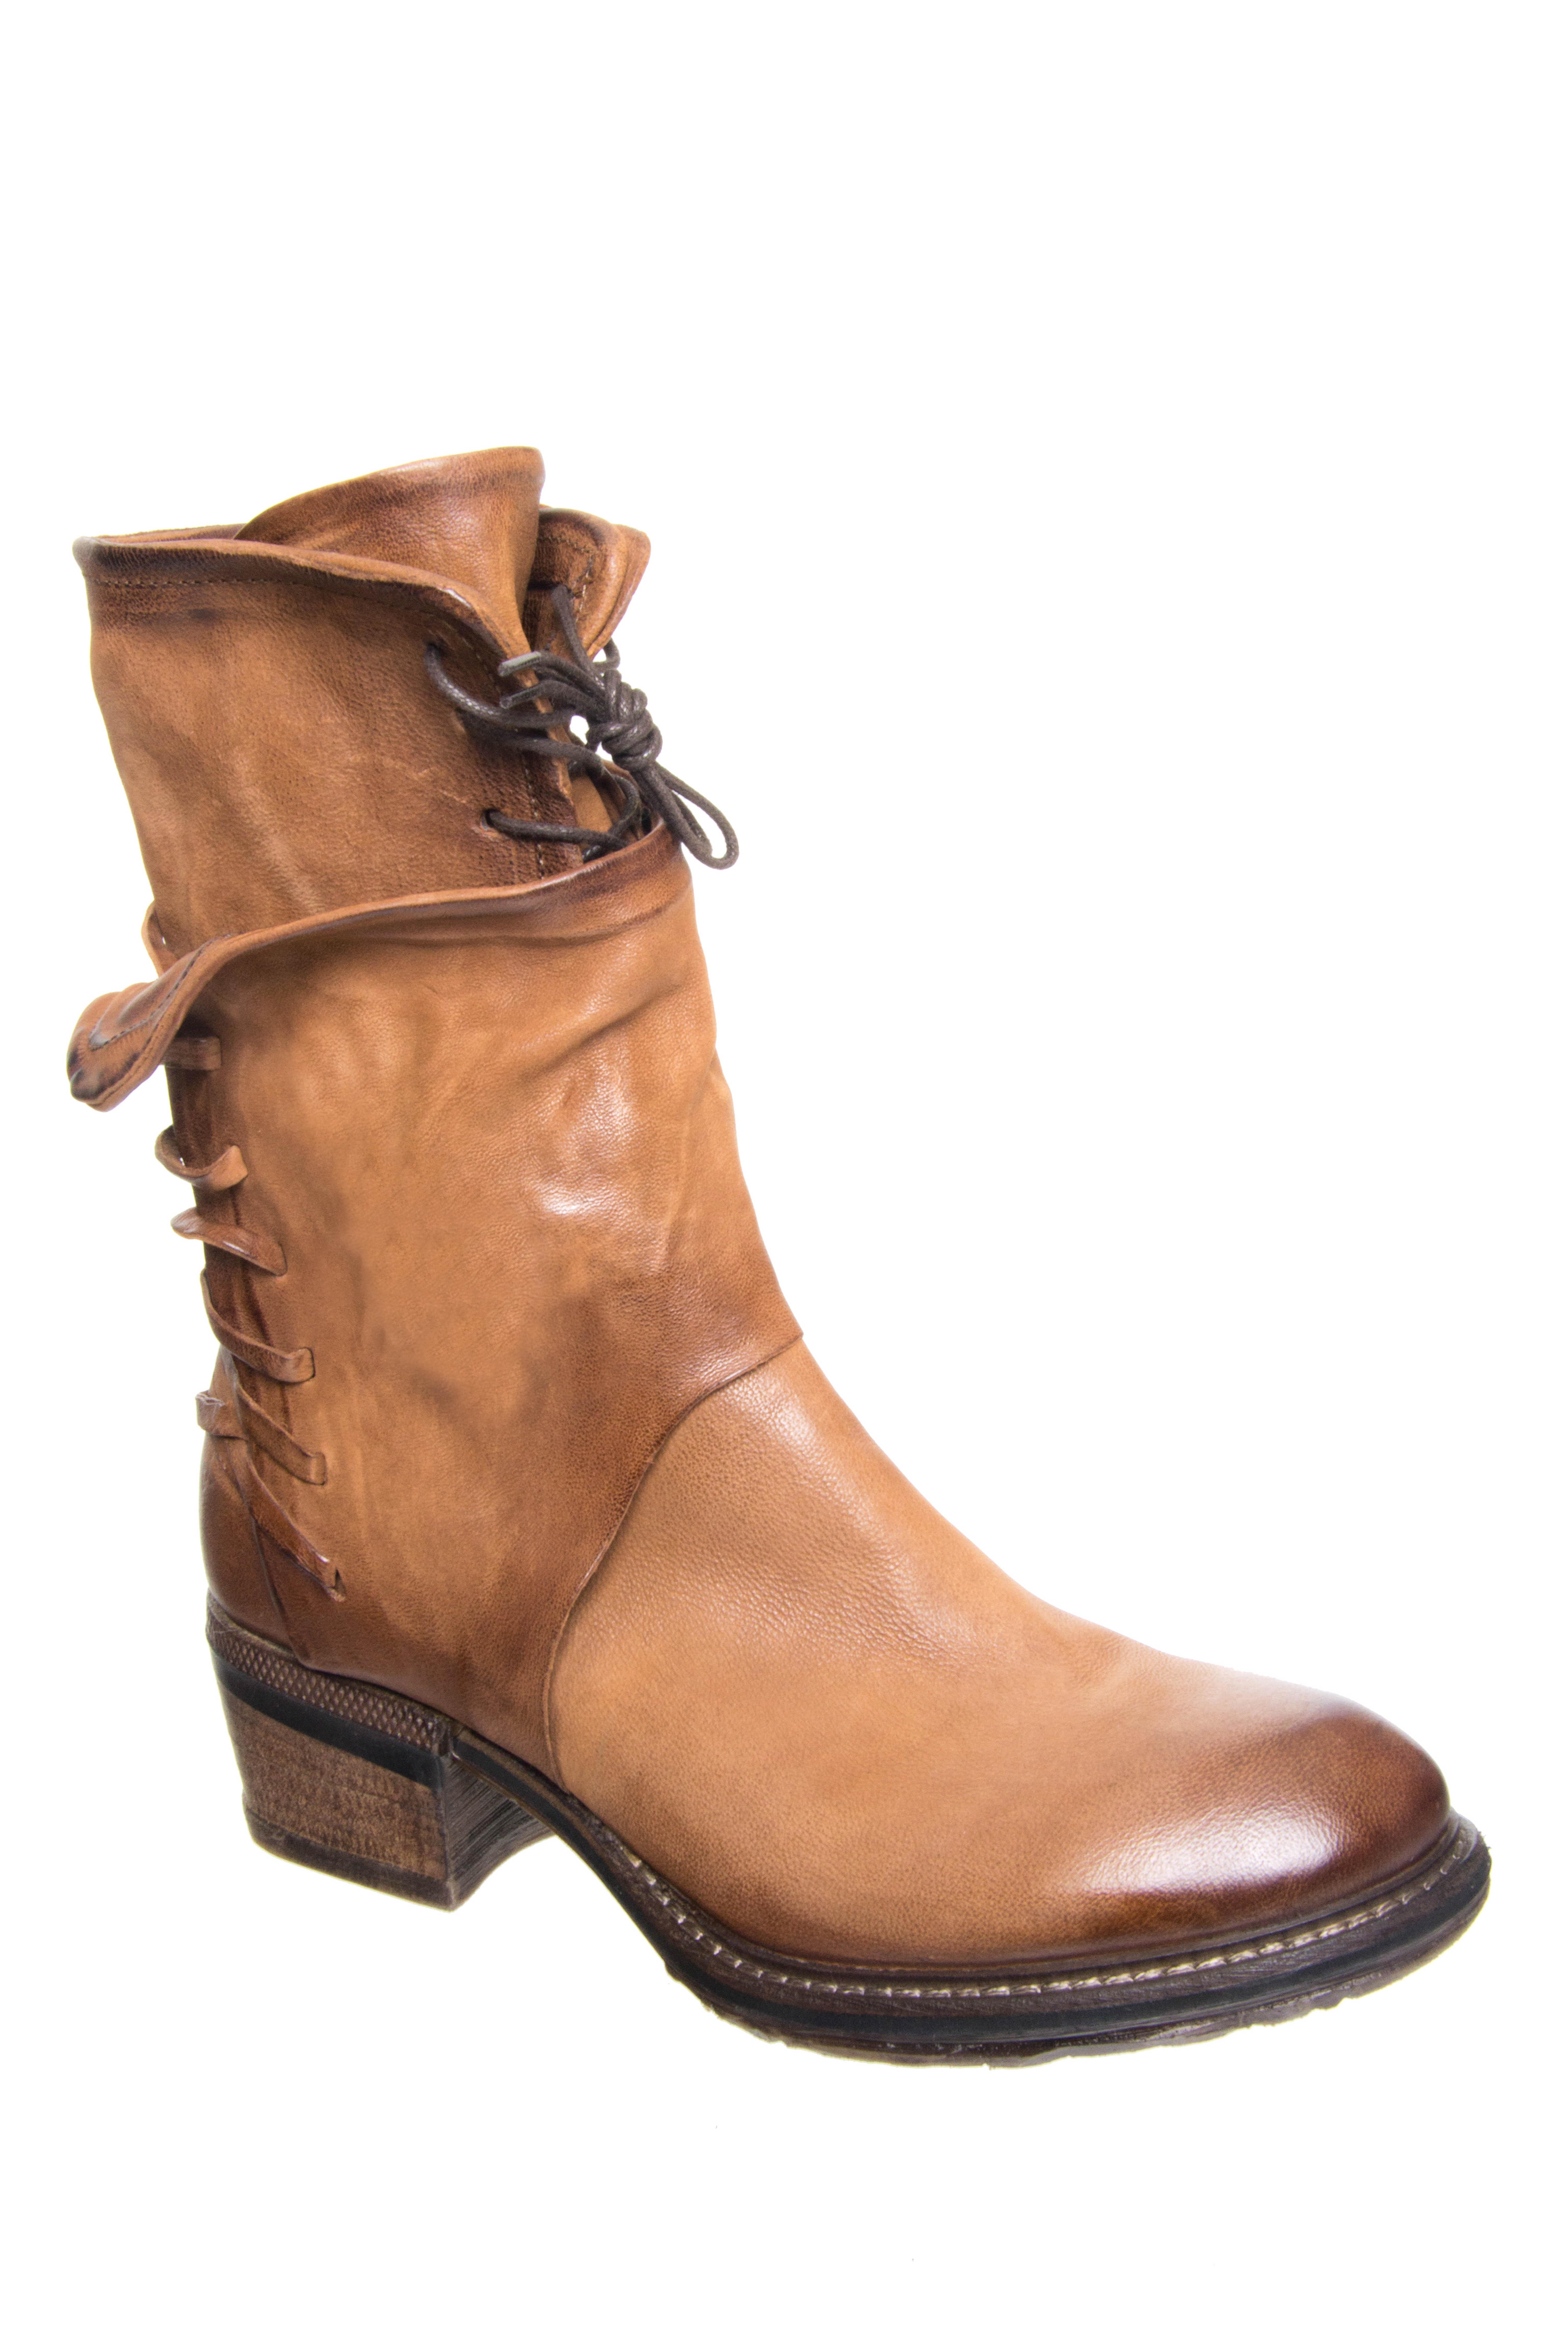 A.S.98 Chet Mid Heel Boots - Castagna